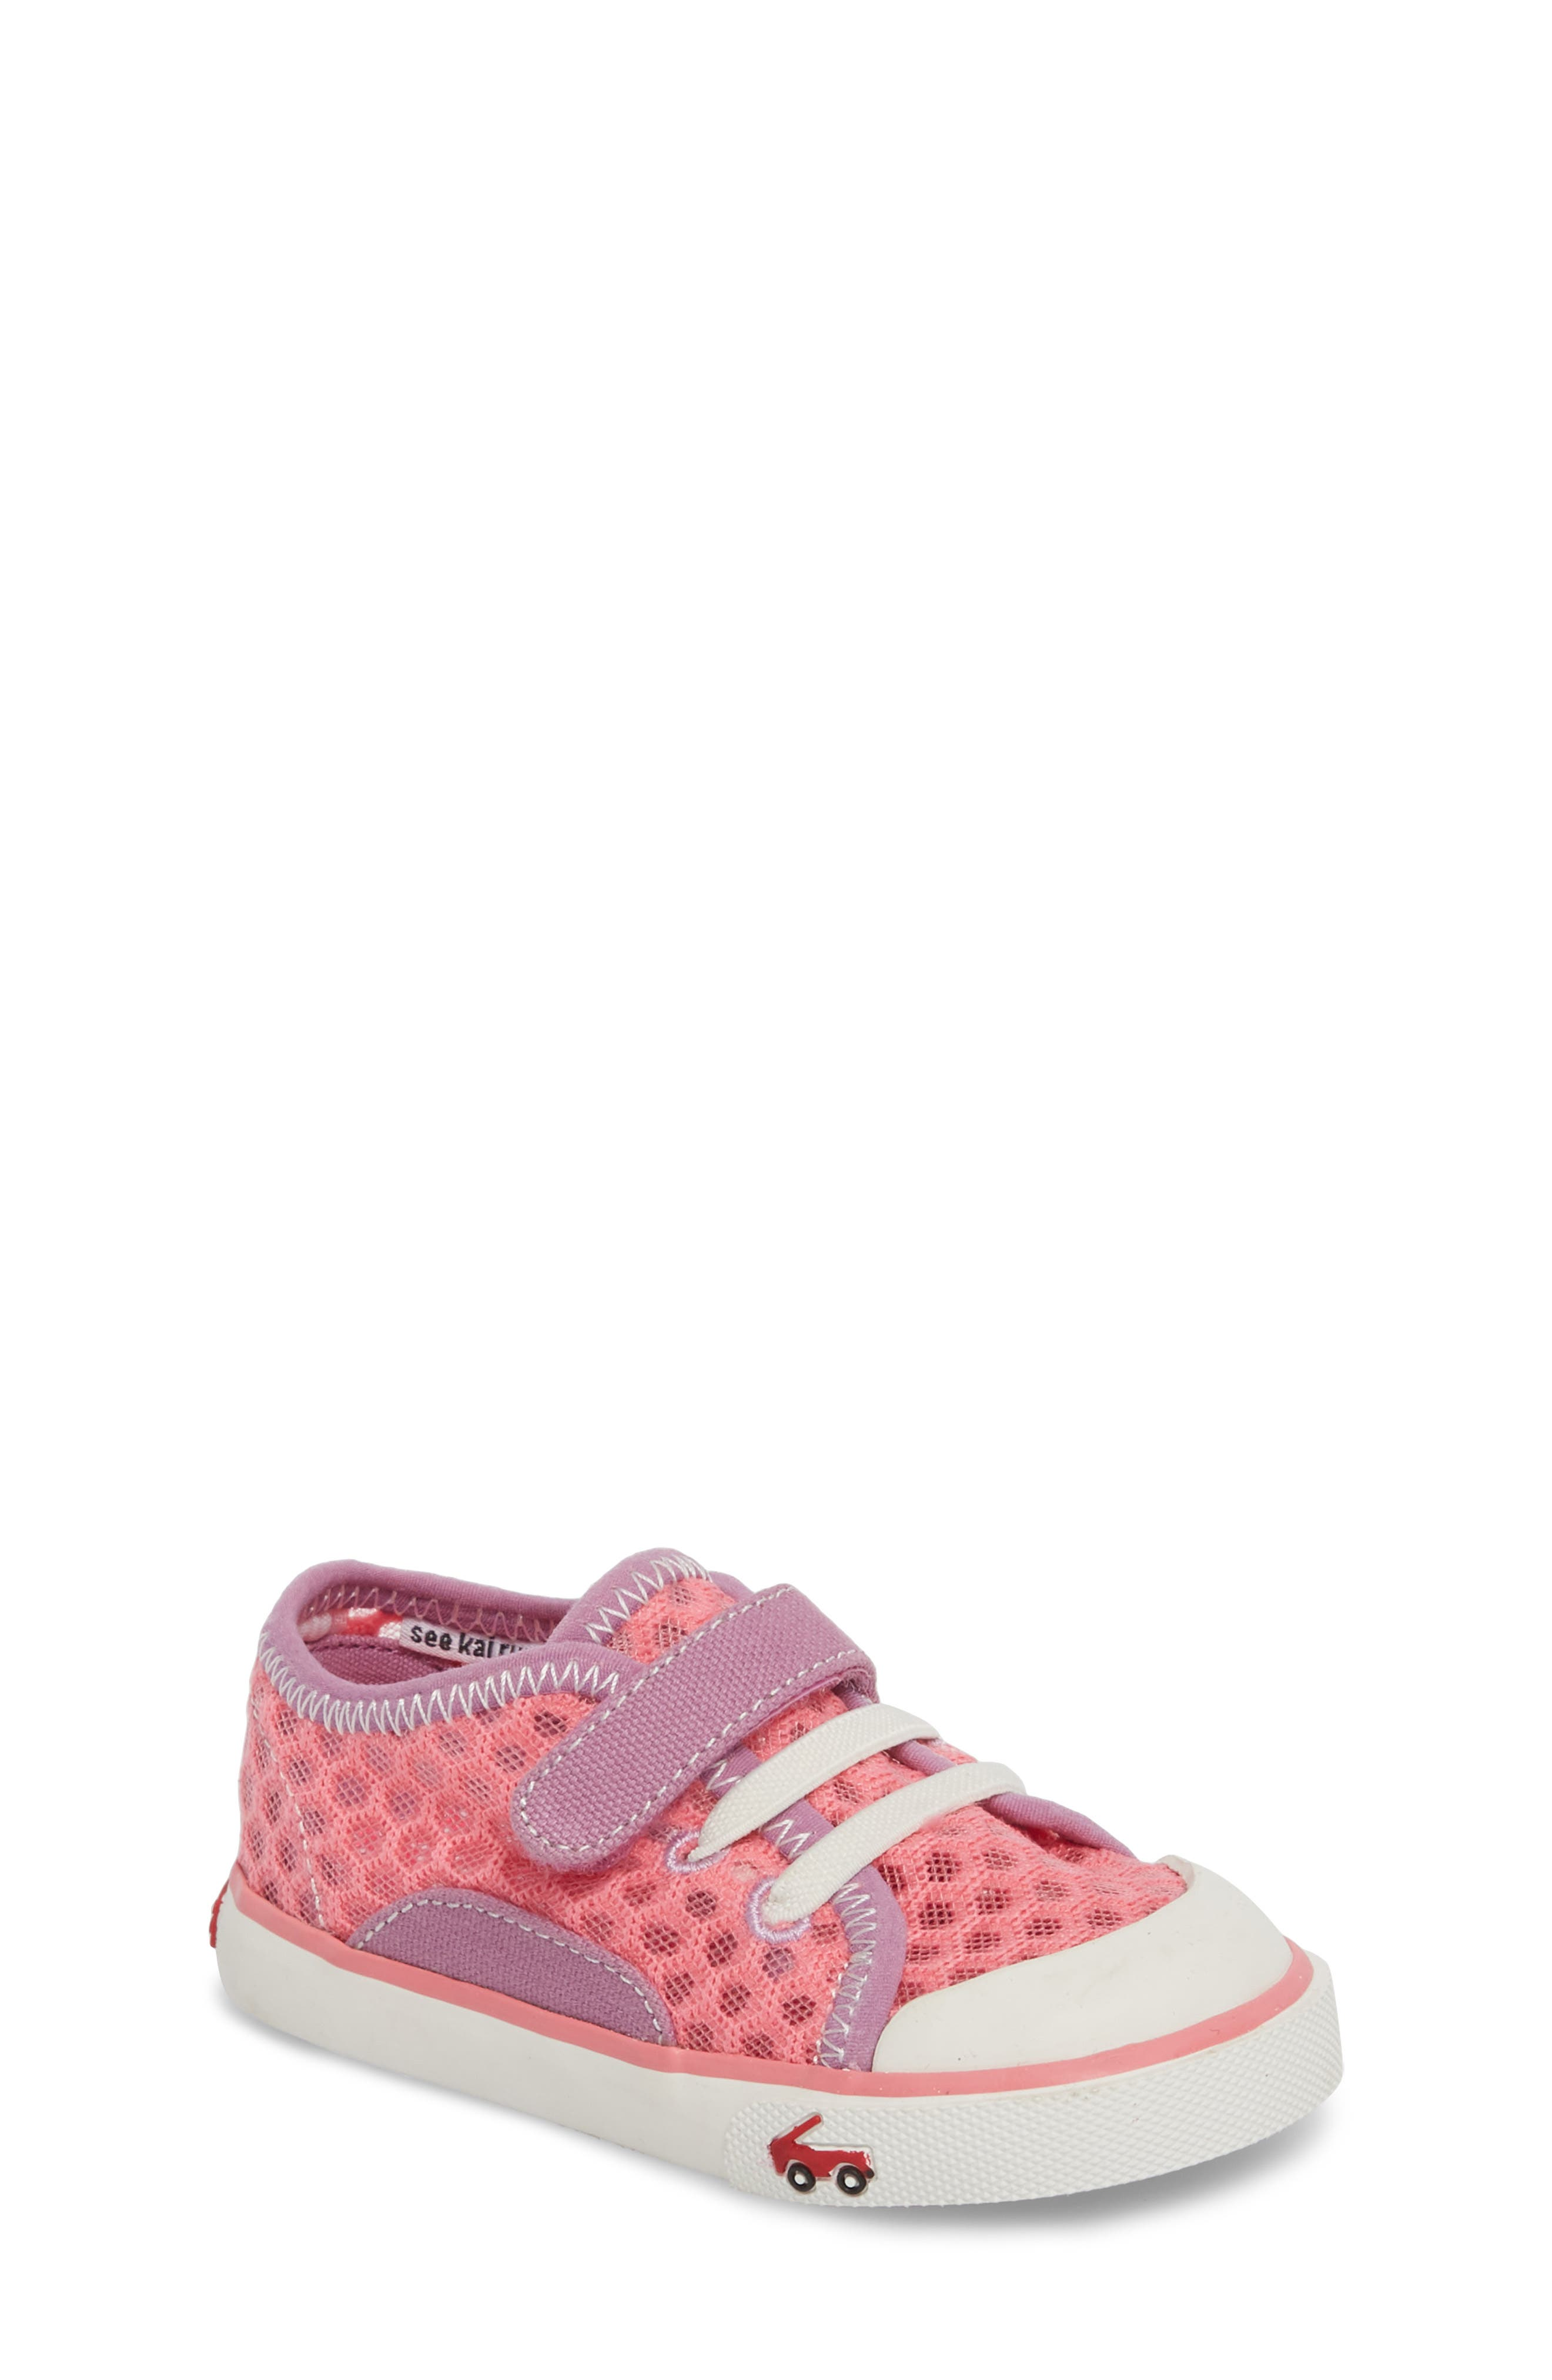 Saylor Sneaker,                         Main,                         color, Hot Pink